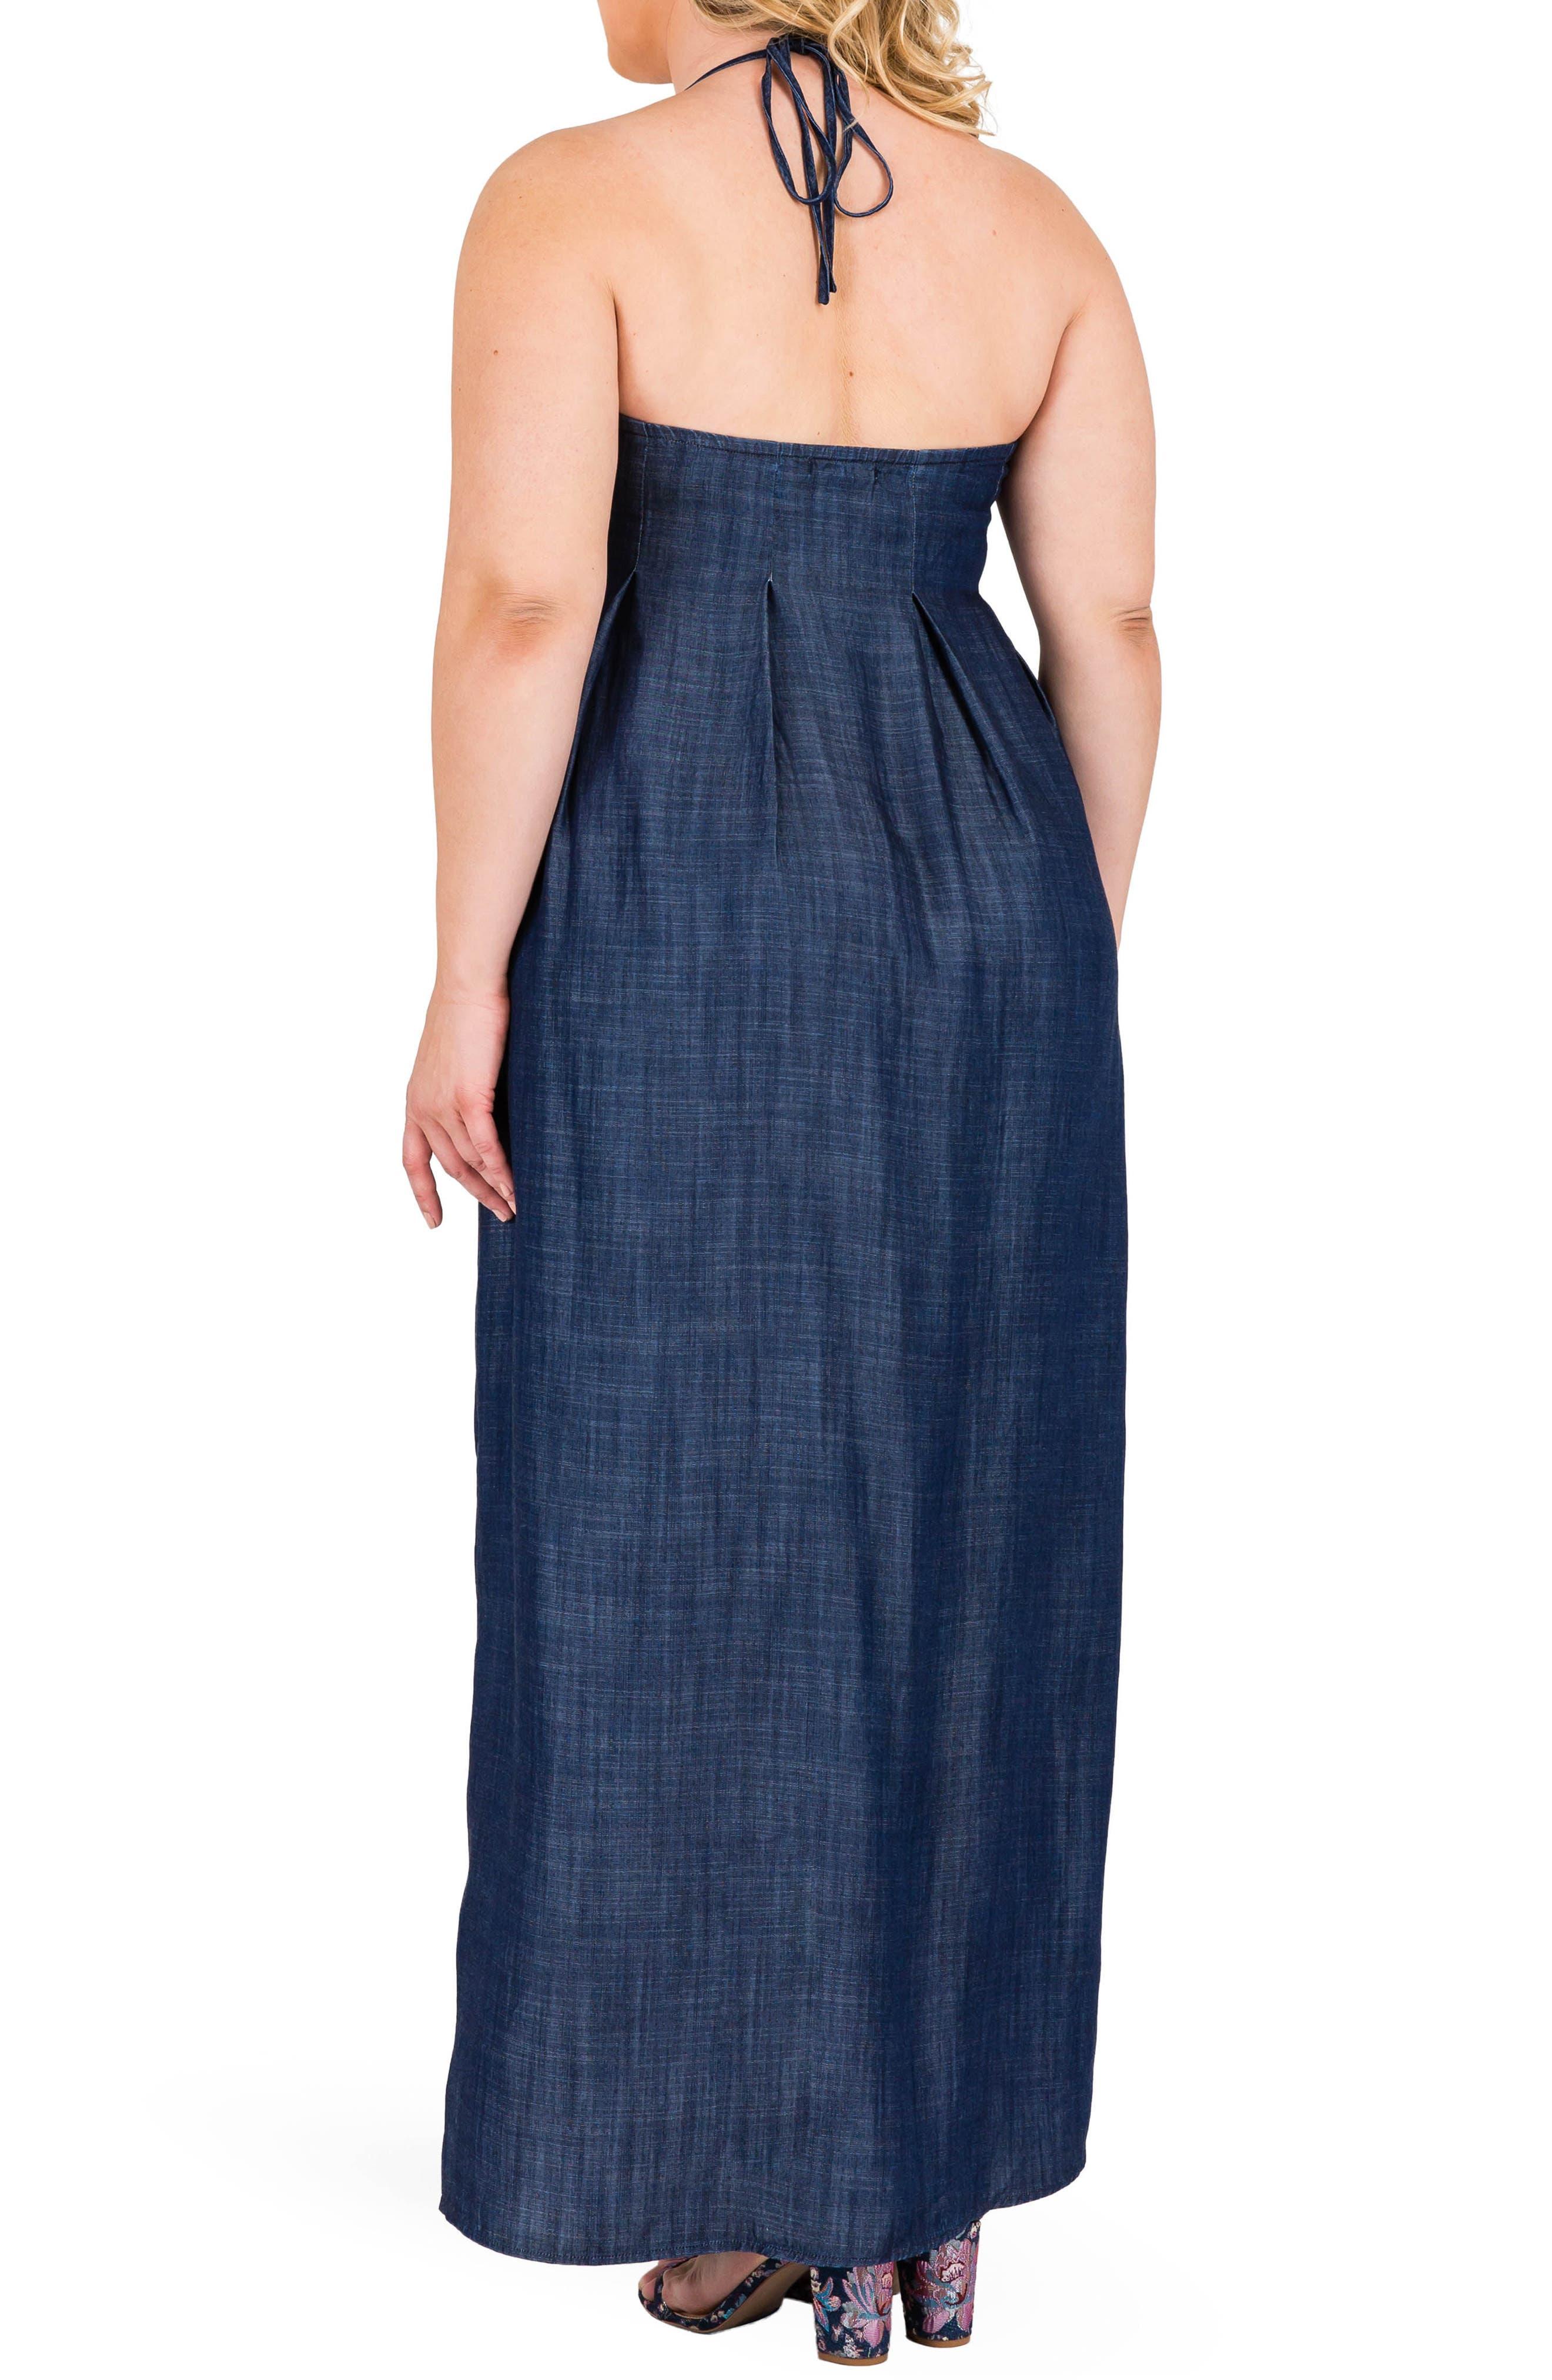 Maui Maxi Chambray Halter Dress,                             Alternate thumbnail 2, color,                             DARK BLUE